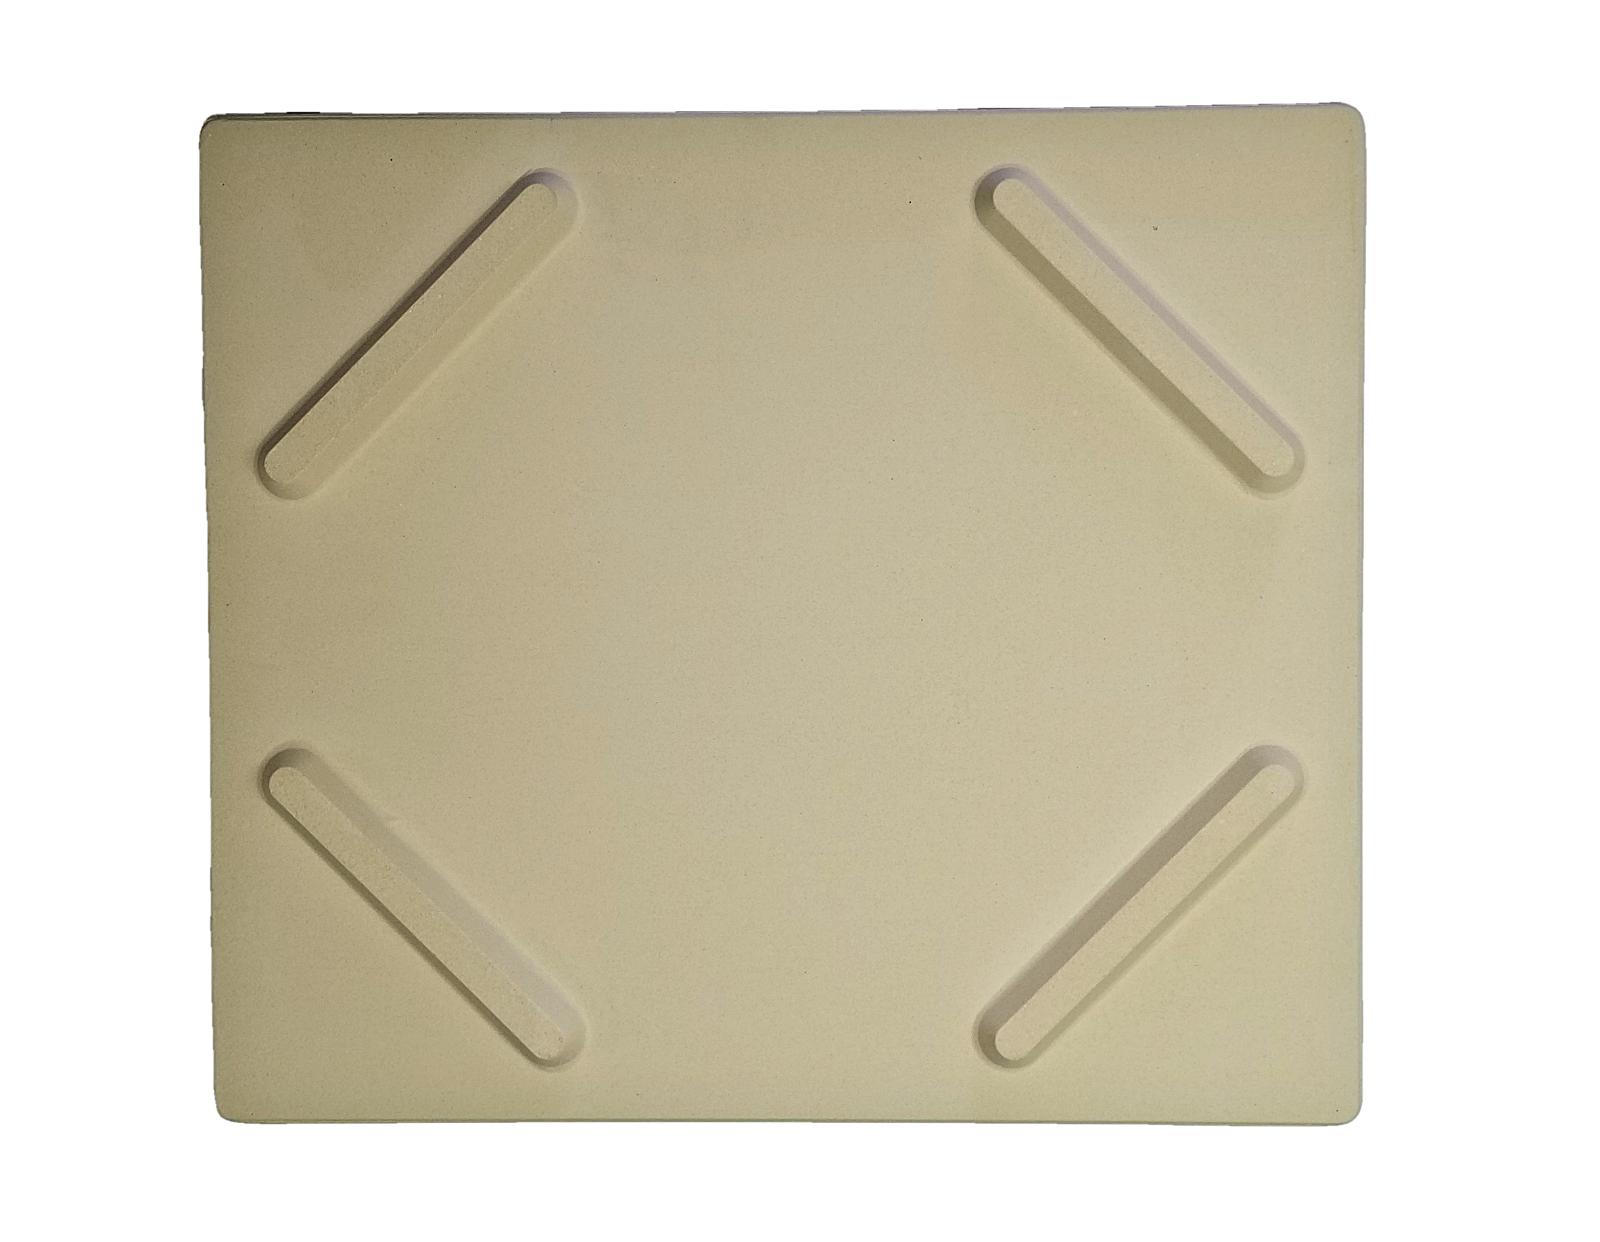 Davy Crockett Pizza Stone + Rocker Pizza Cutter - Stainless Steel/Wood Handle